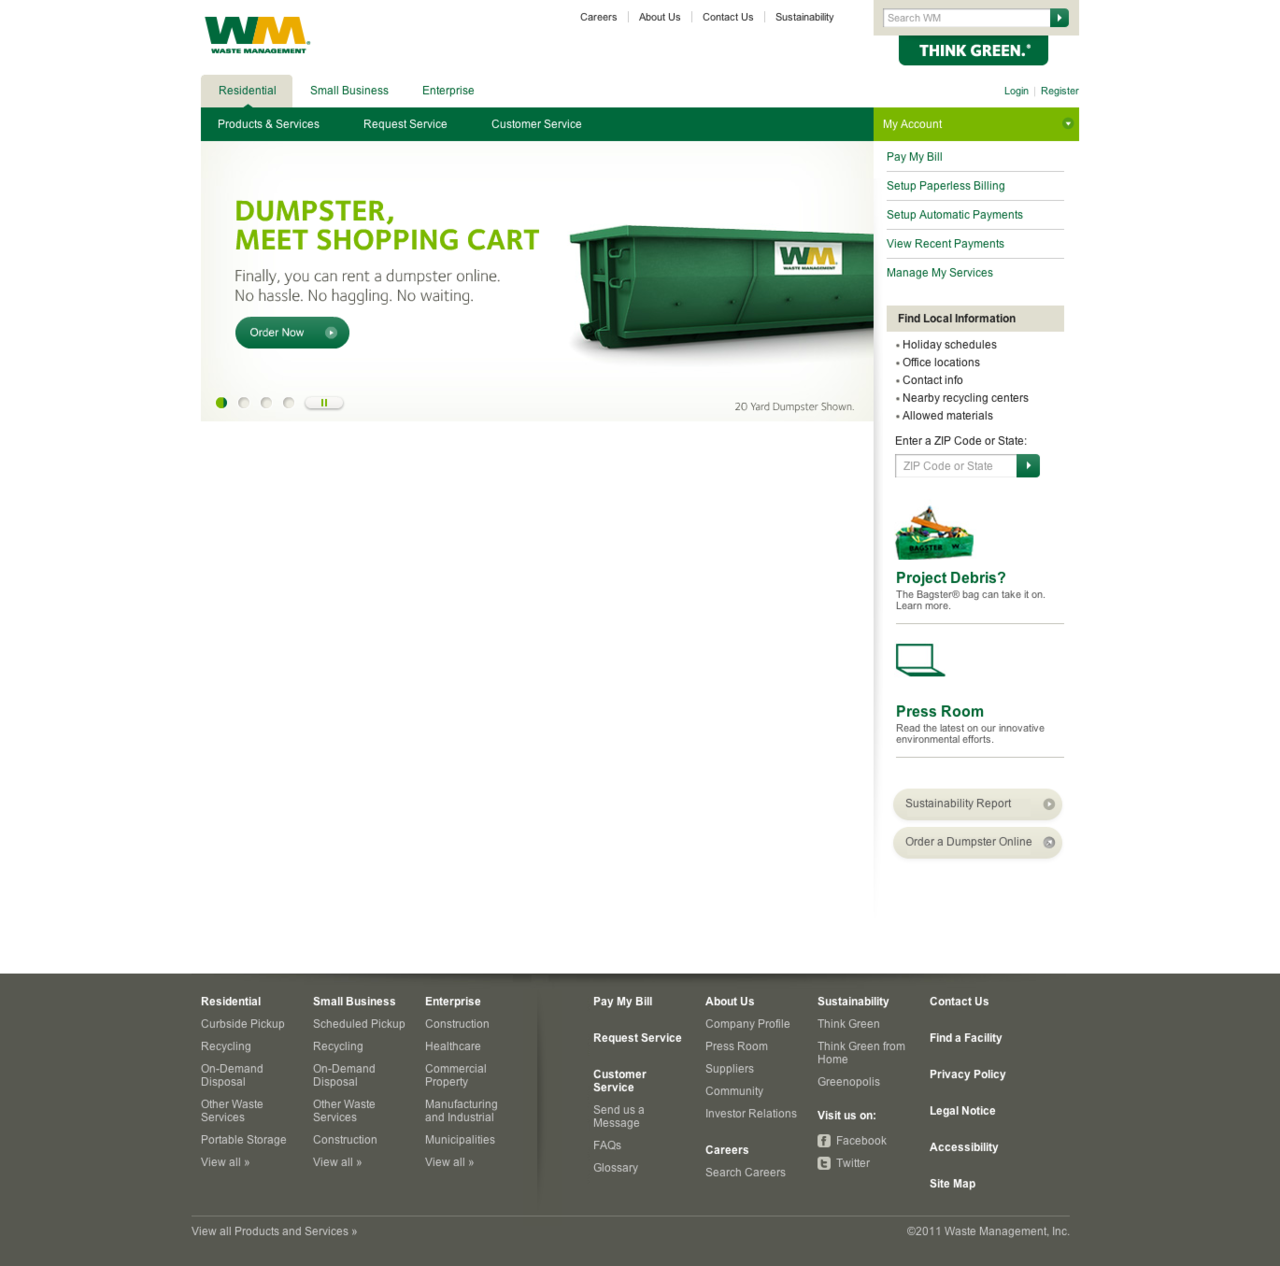 www.wm.com